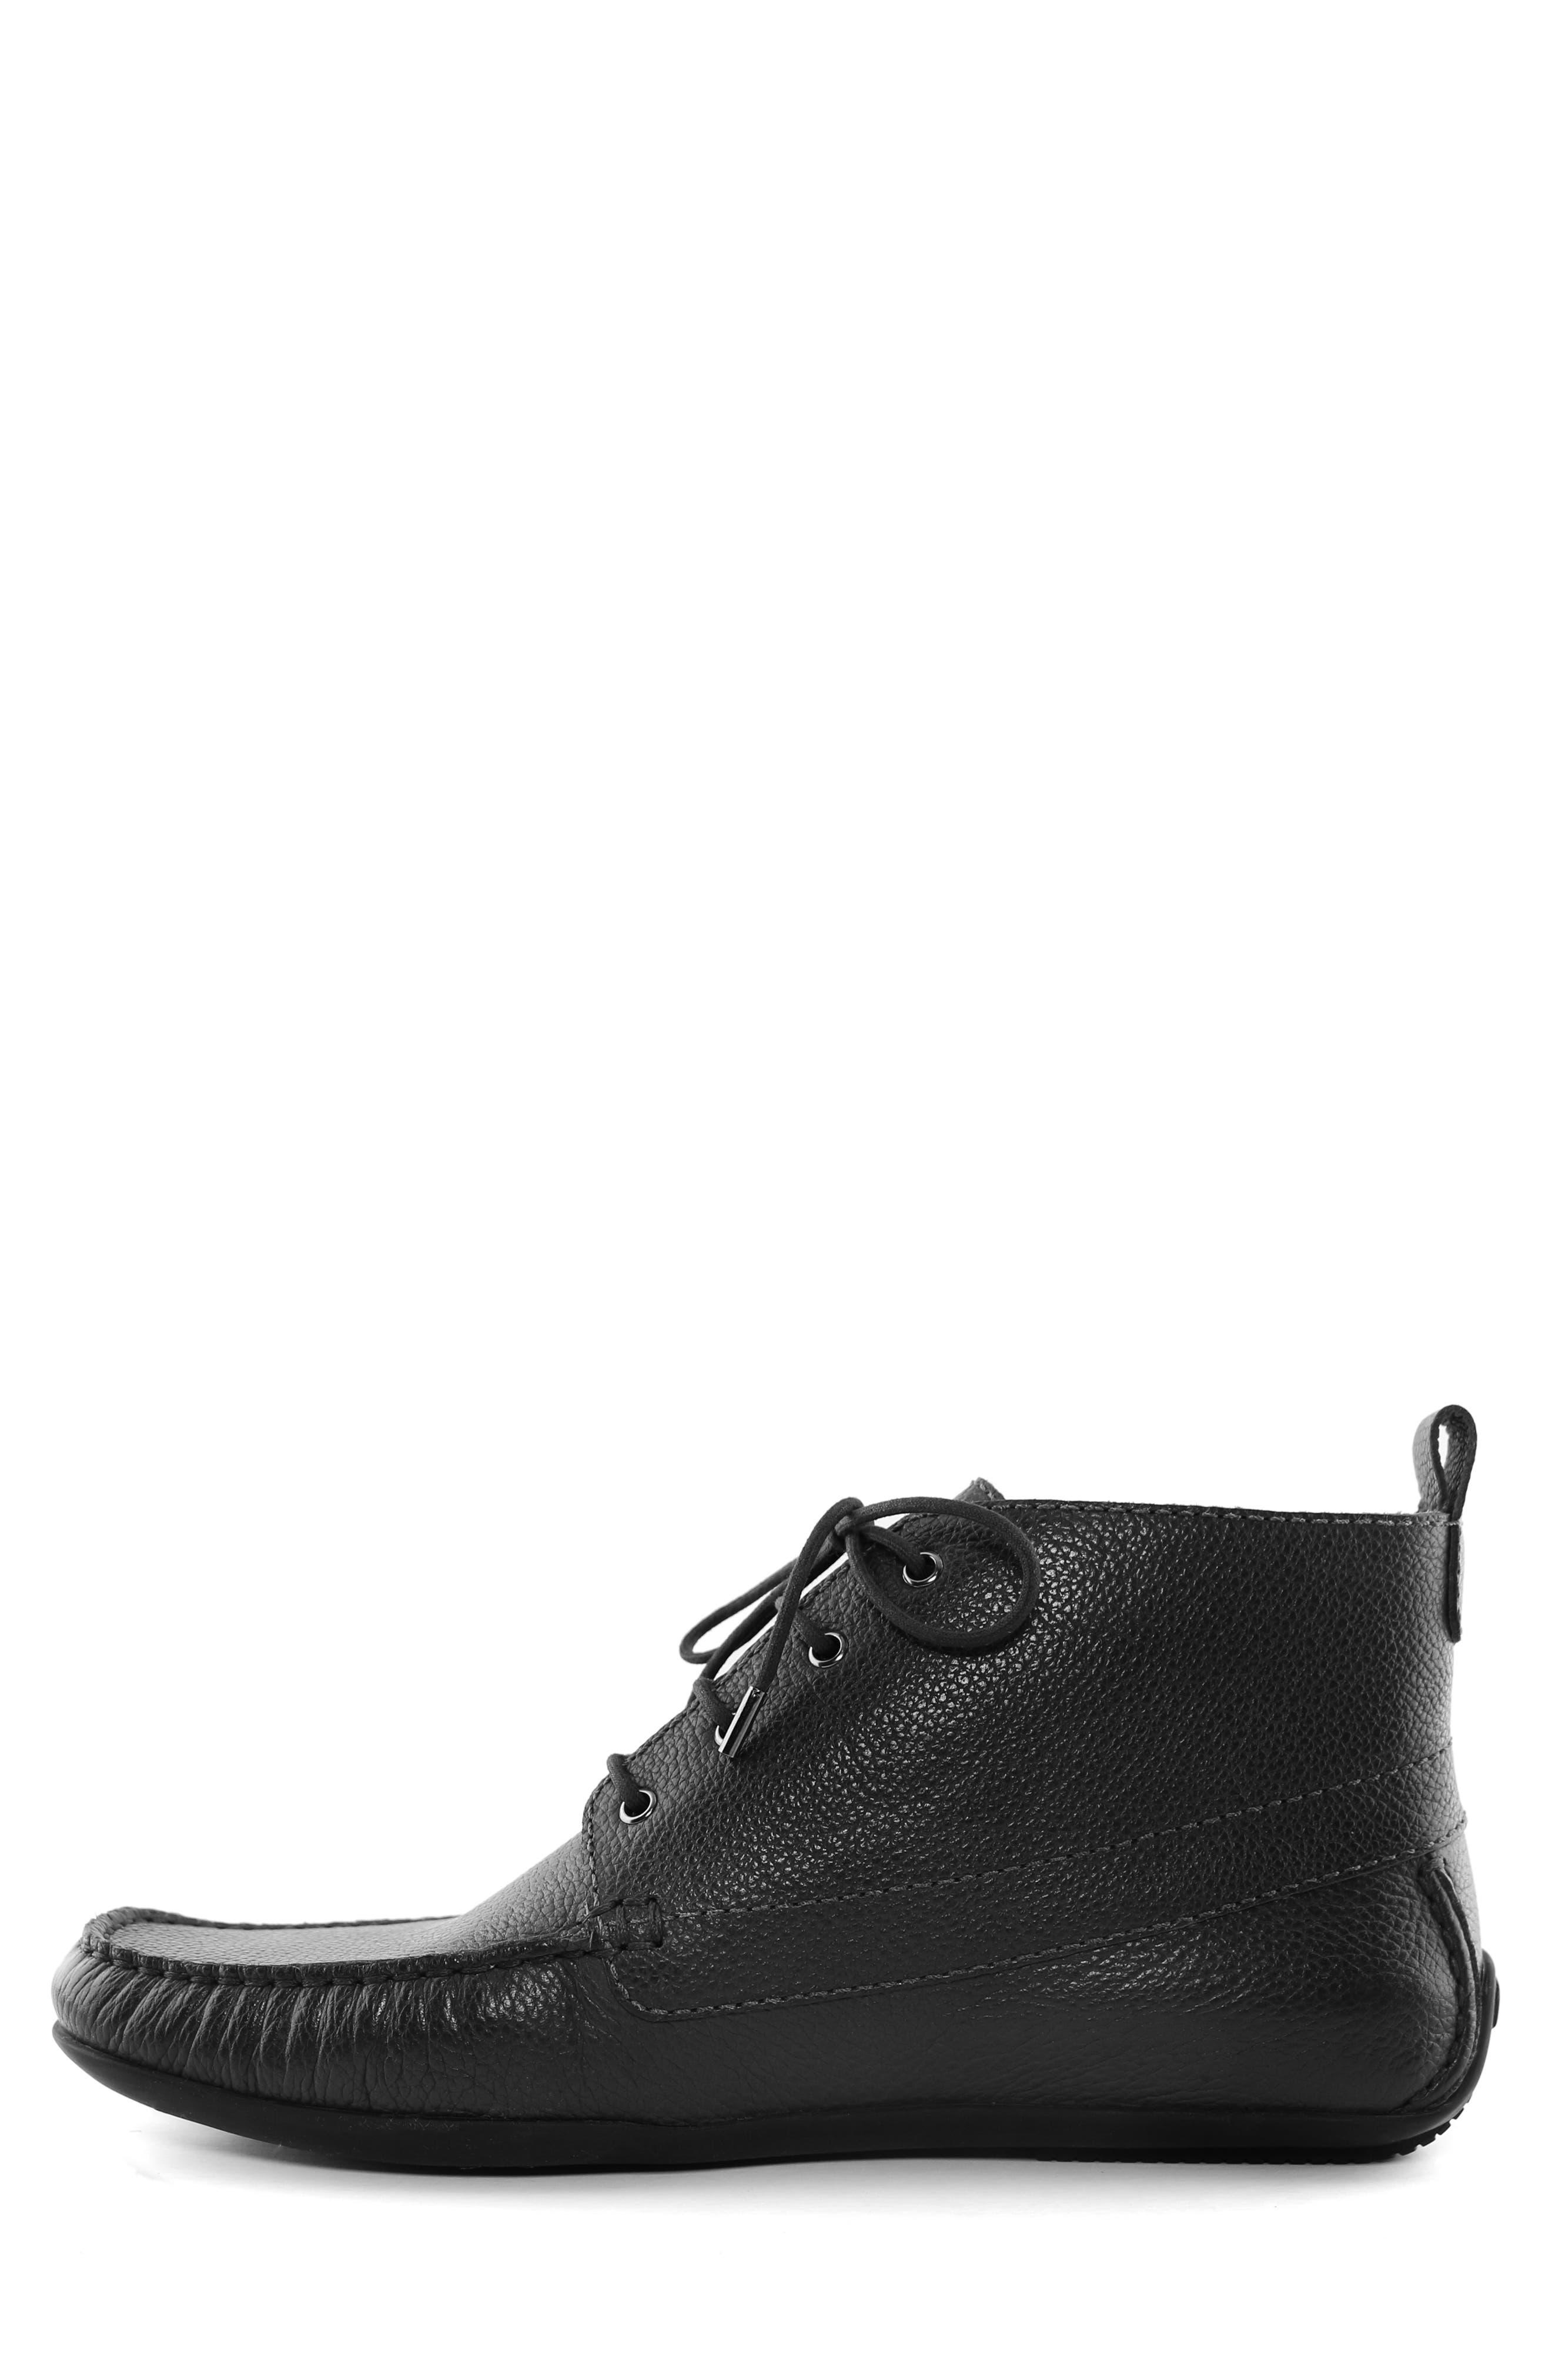 MARC JOSEPH NEW YORK, Soho Boot 2 Chukka Boot, Alternate thumbnail 8, color, BLACK LEATHER